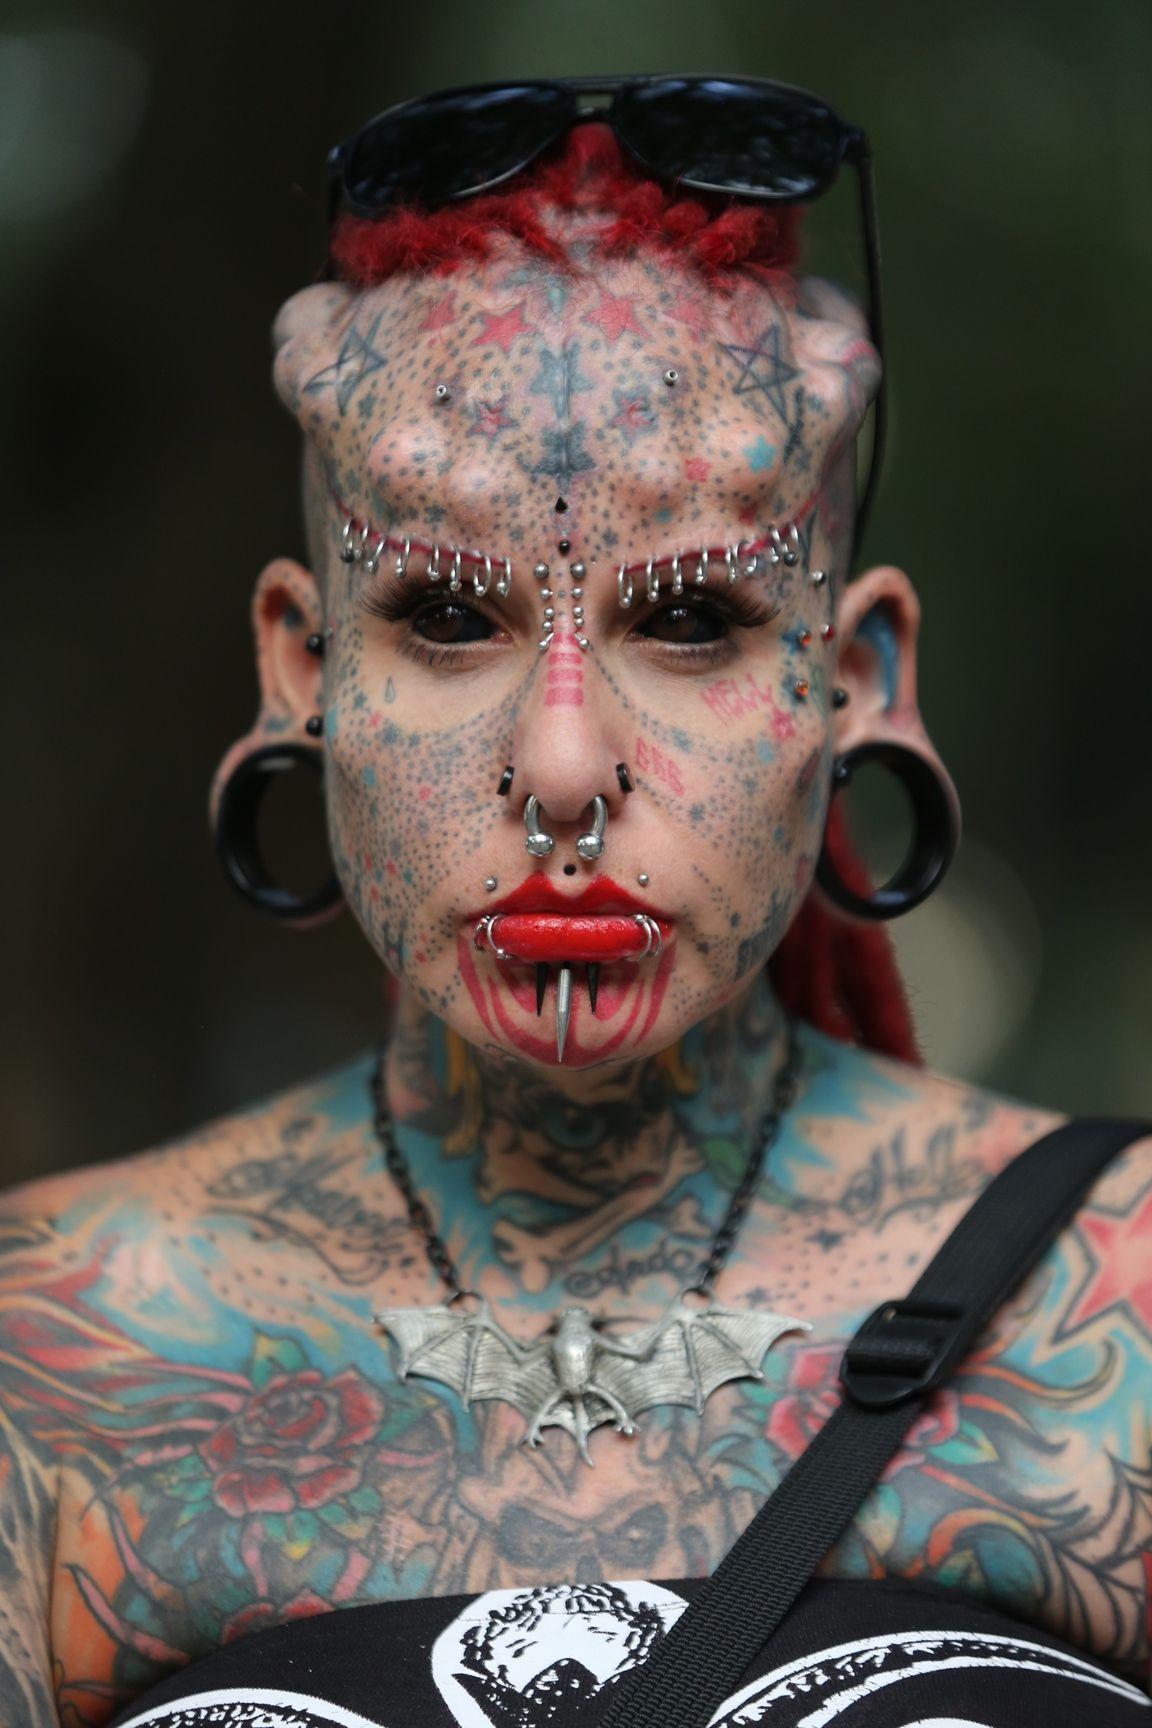 zagruzka-zhopu-foto-tolstih-s-pirsingom-i-tatuirovkami-poisk